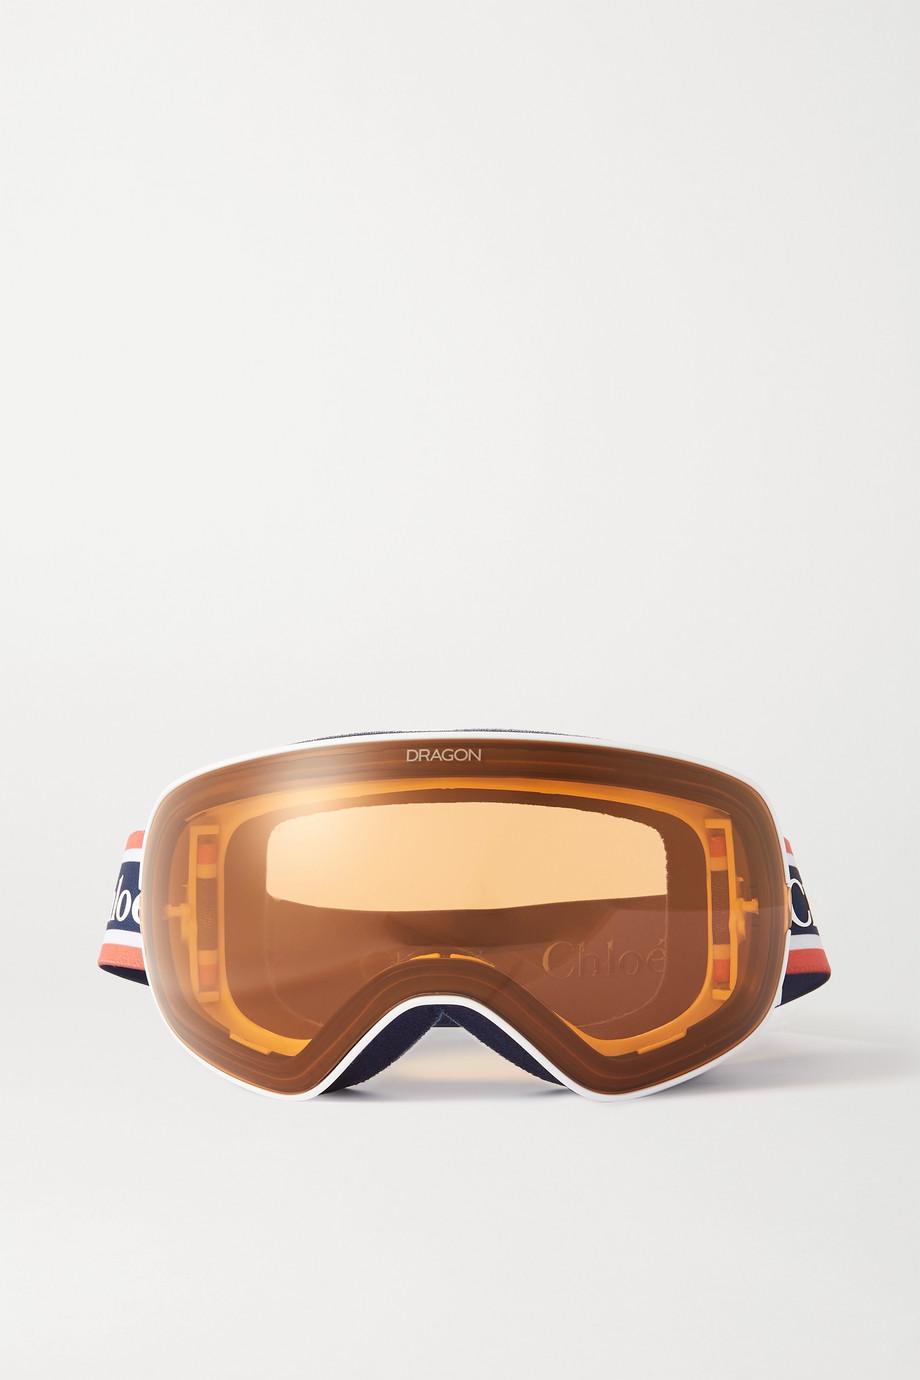 Chloé + Dragon Cassidy ski goggles